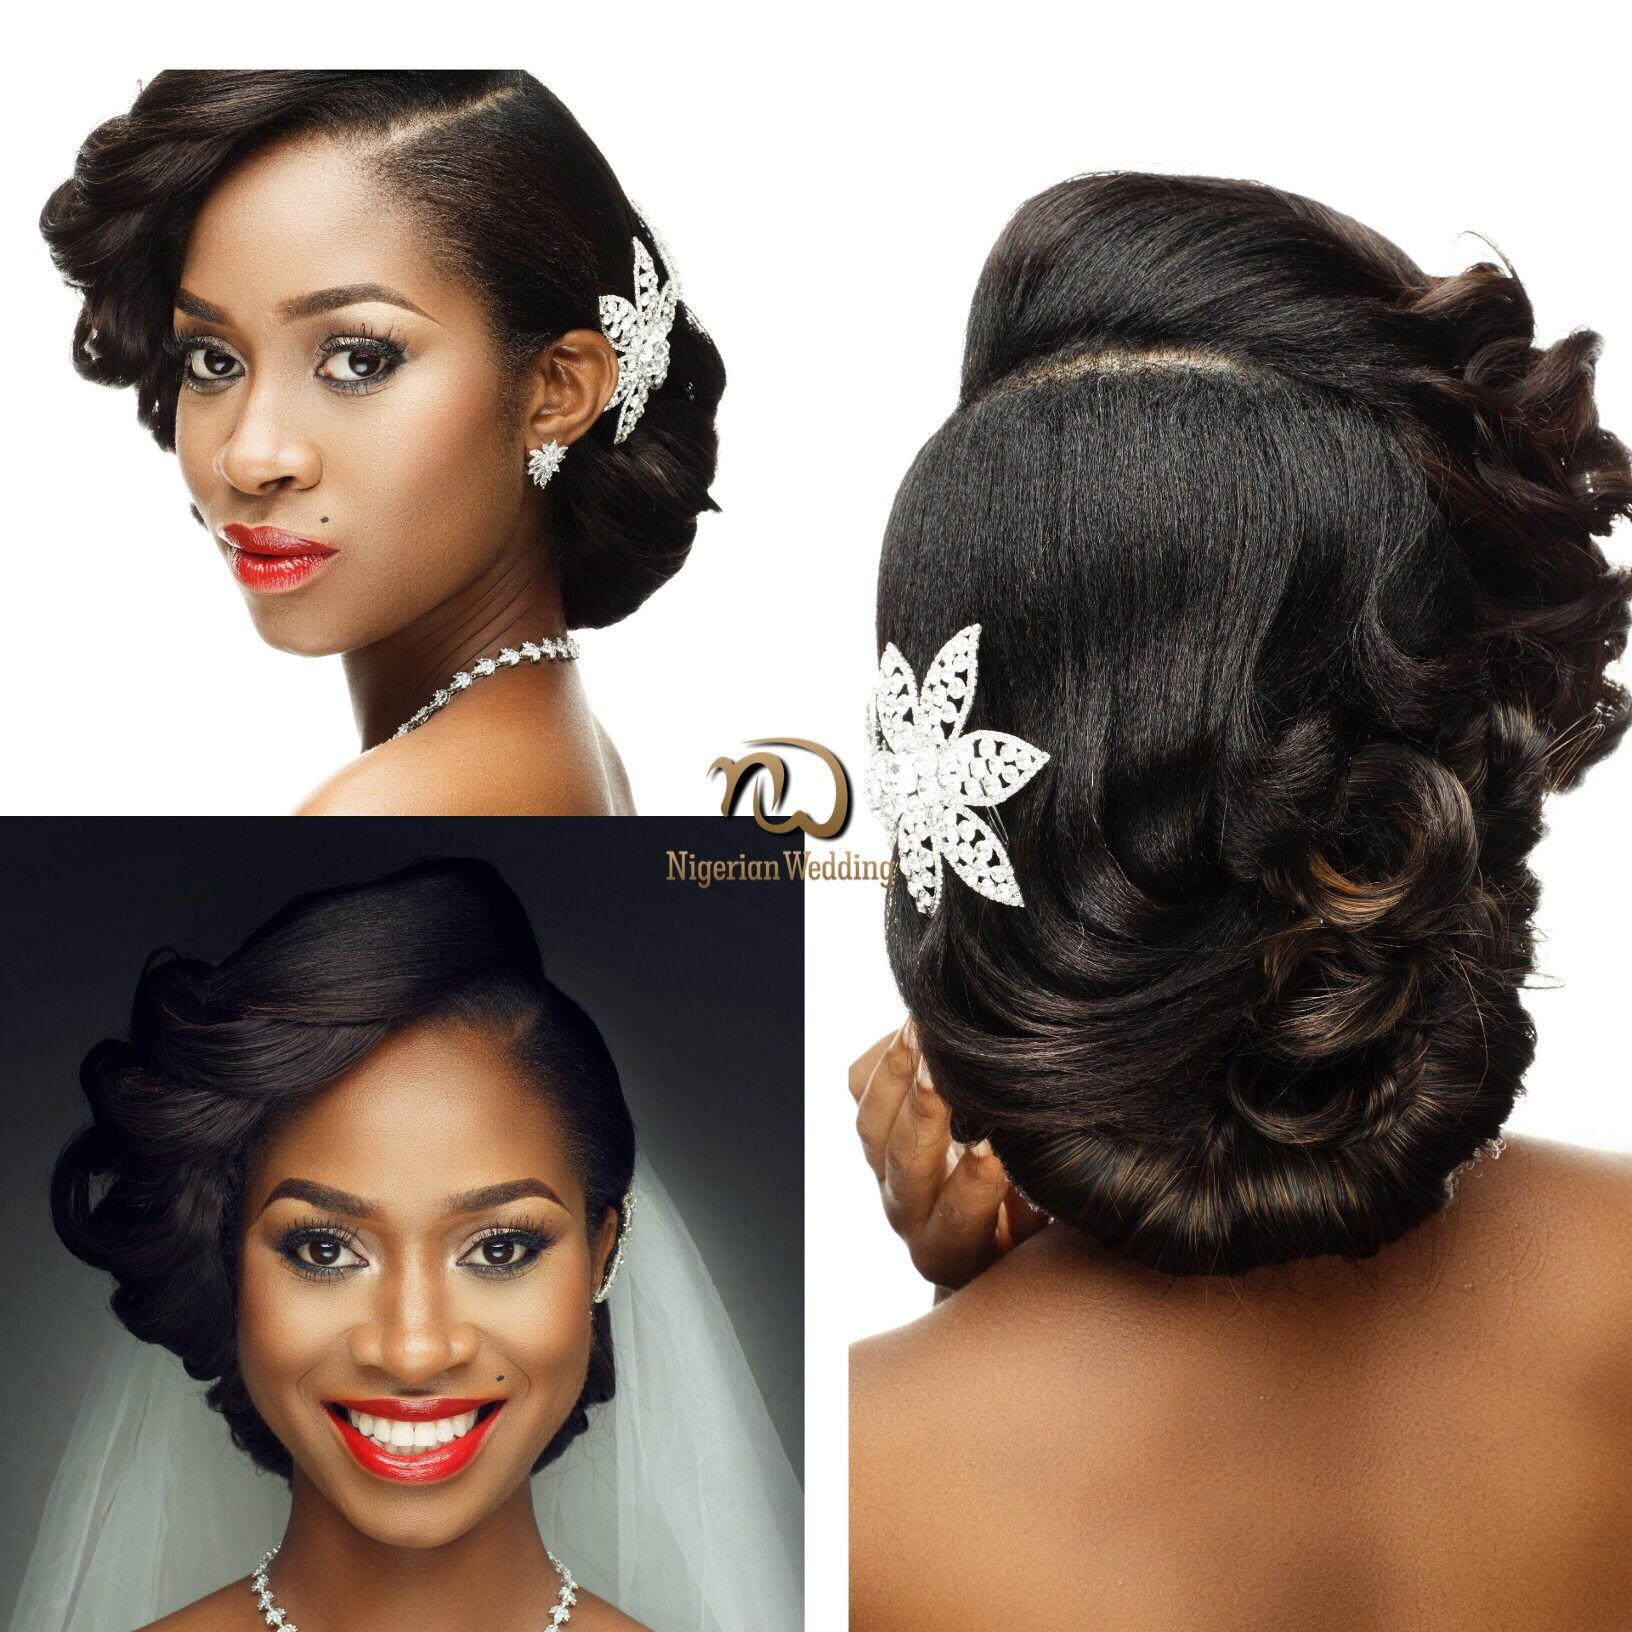 Wedding Hairstyles In Nigeria: Wedding Hairstyles For Nigeria